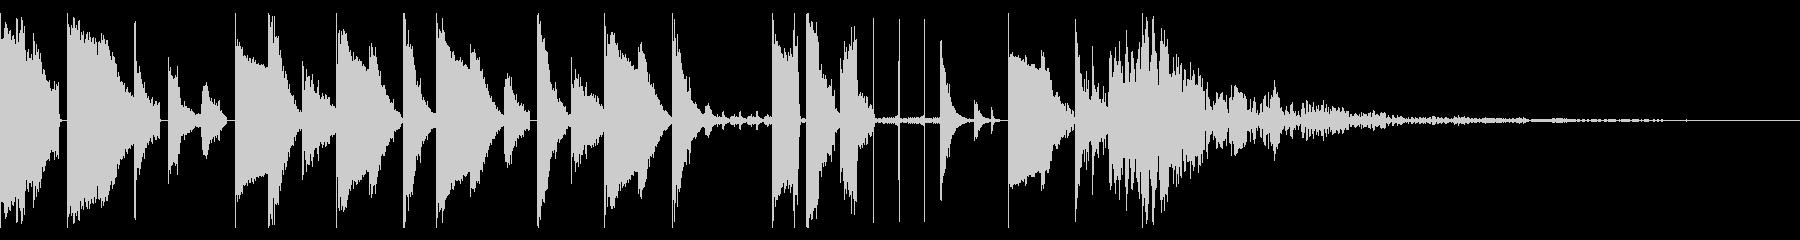 155 BPMの未再生の波形